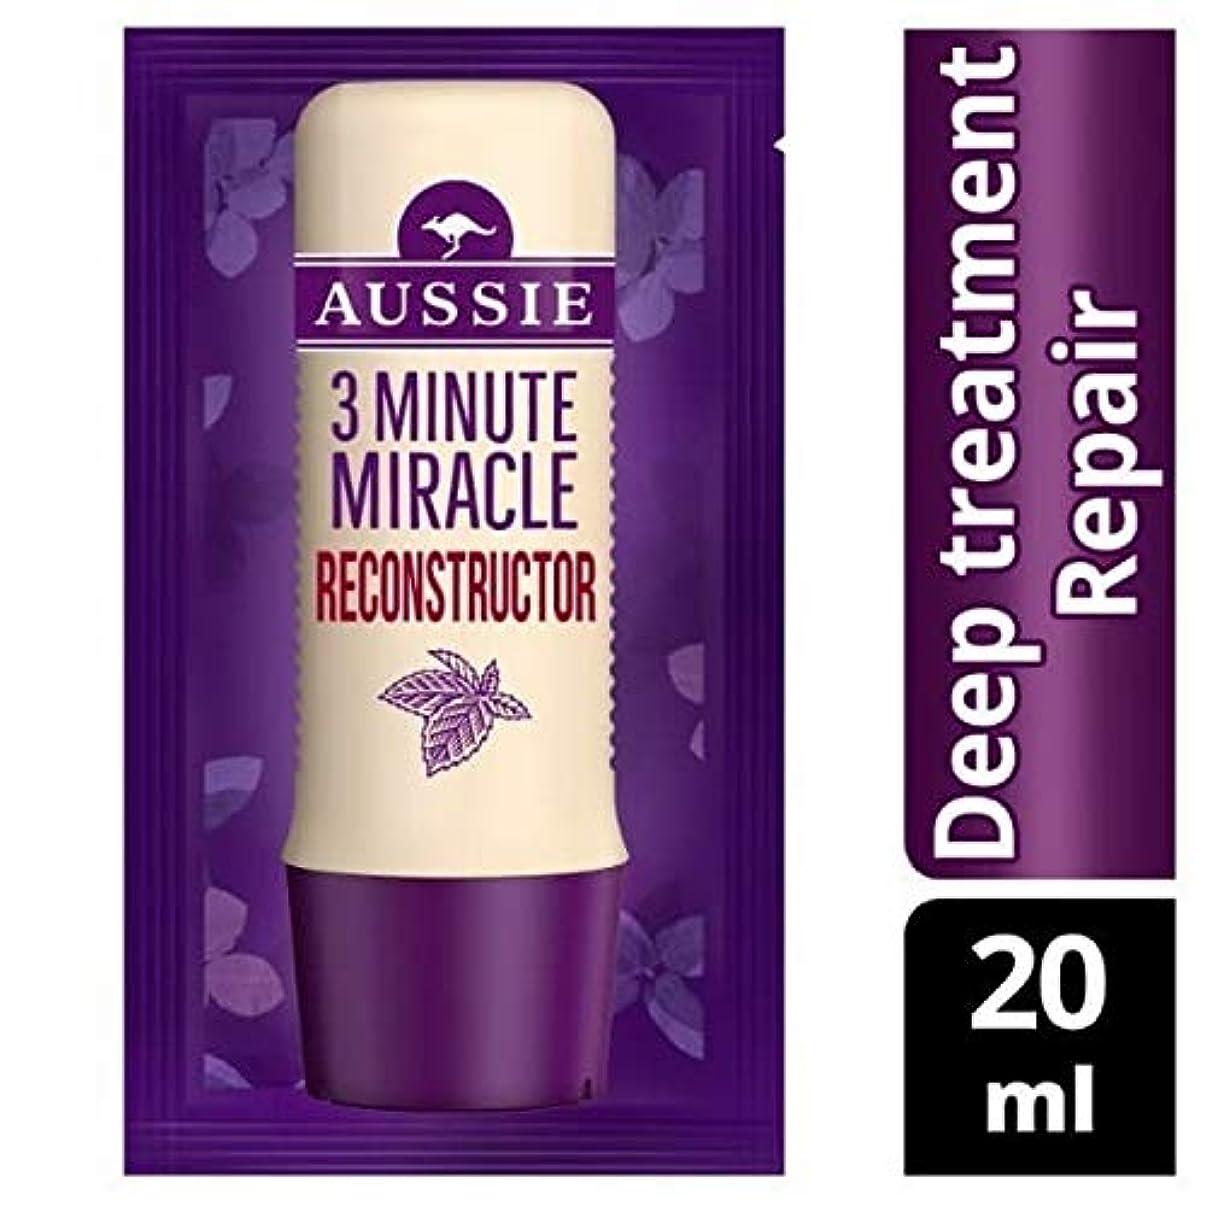 [Aussie ] オーストラリアの深い治療3分の奇跡の再構成の20ミリリットル - Aussie Deep Treatment 3 Minute Miracle Reconstructor 20ml [並行輸入品]